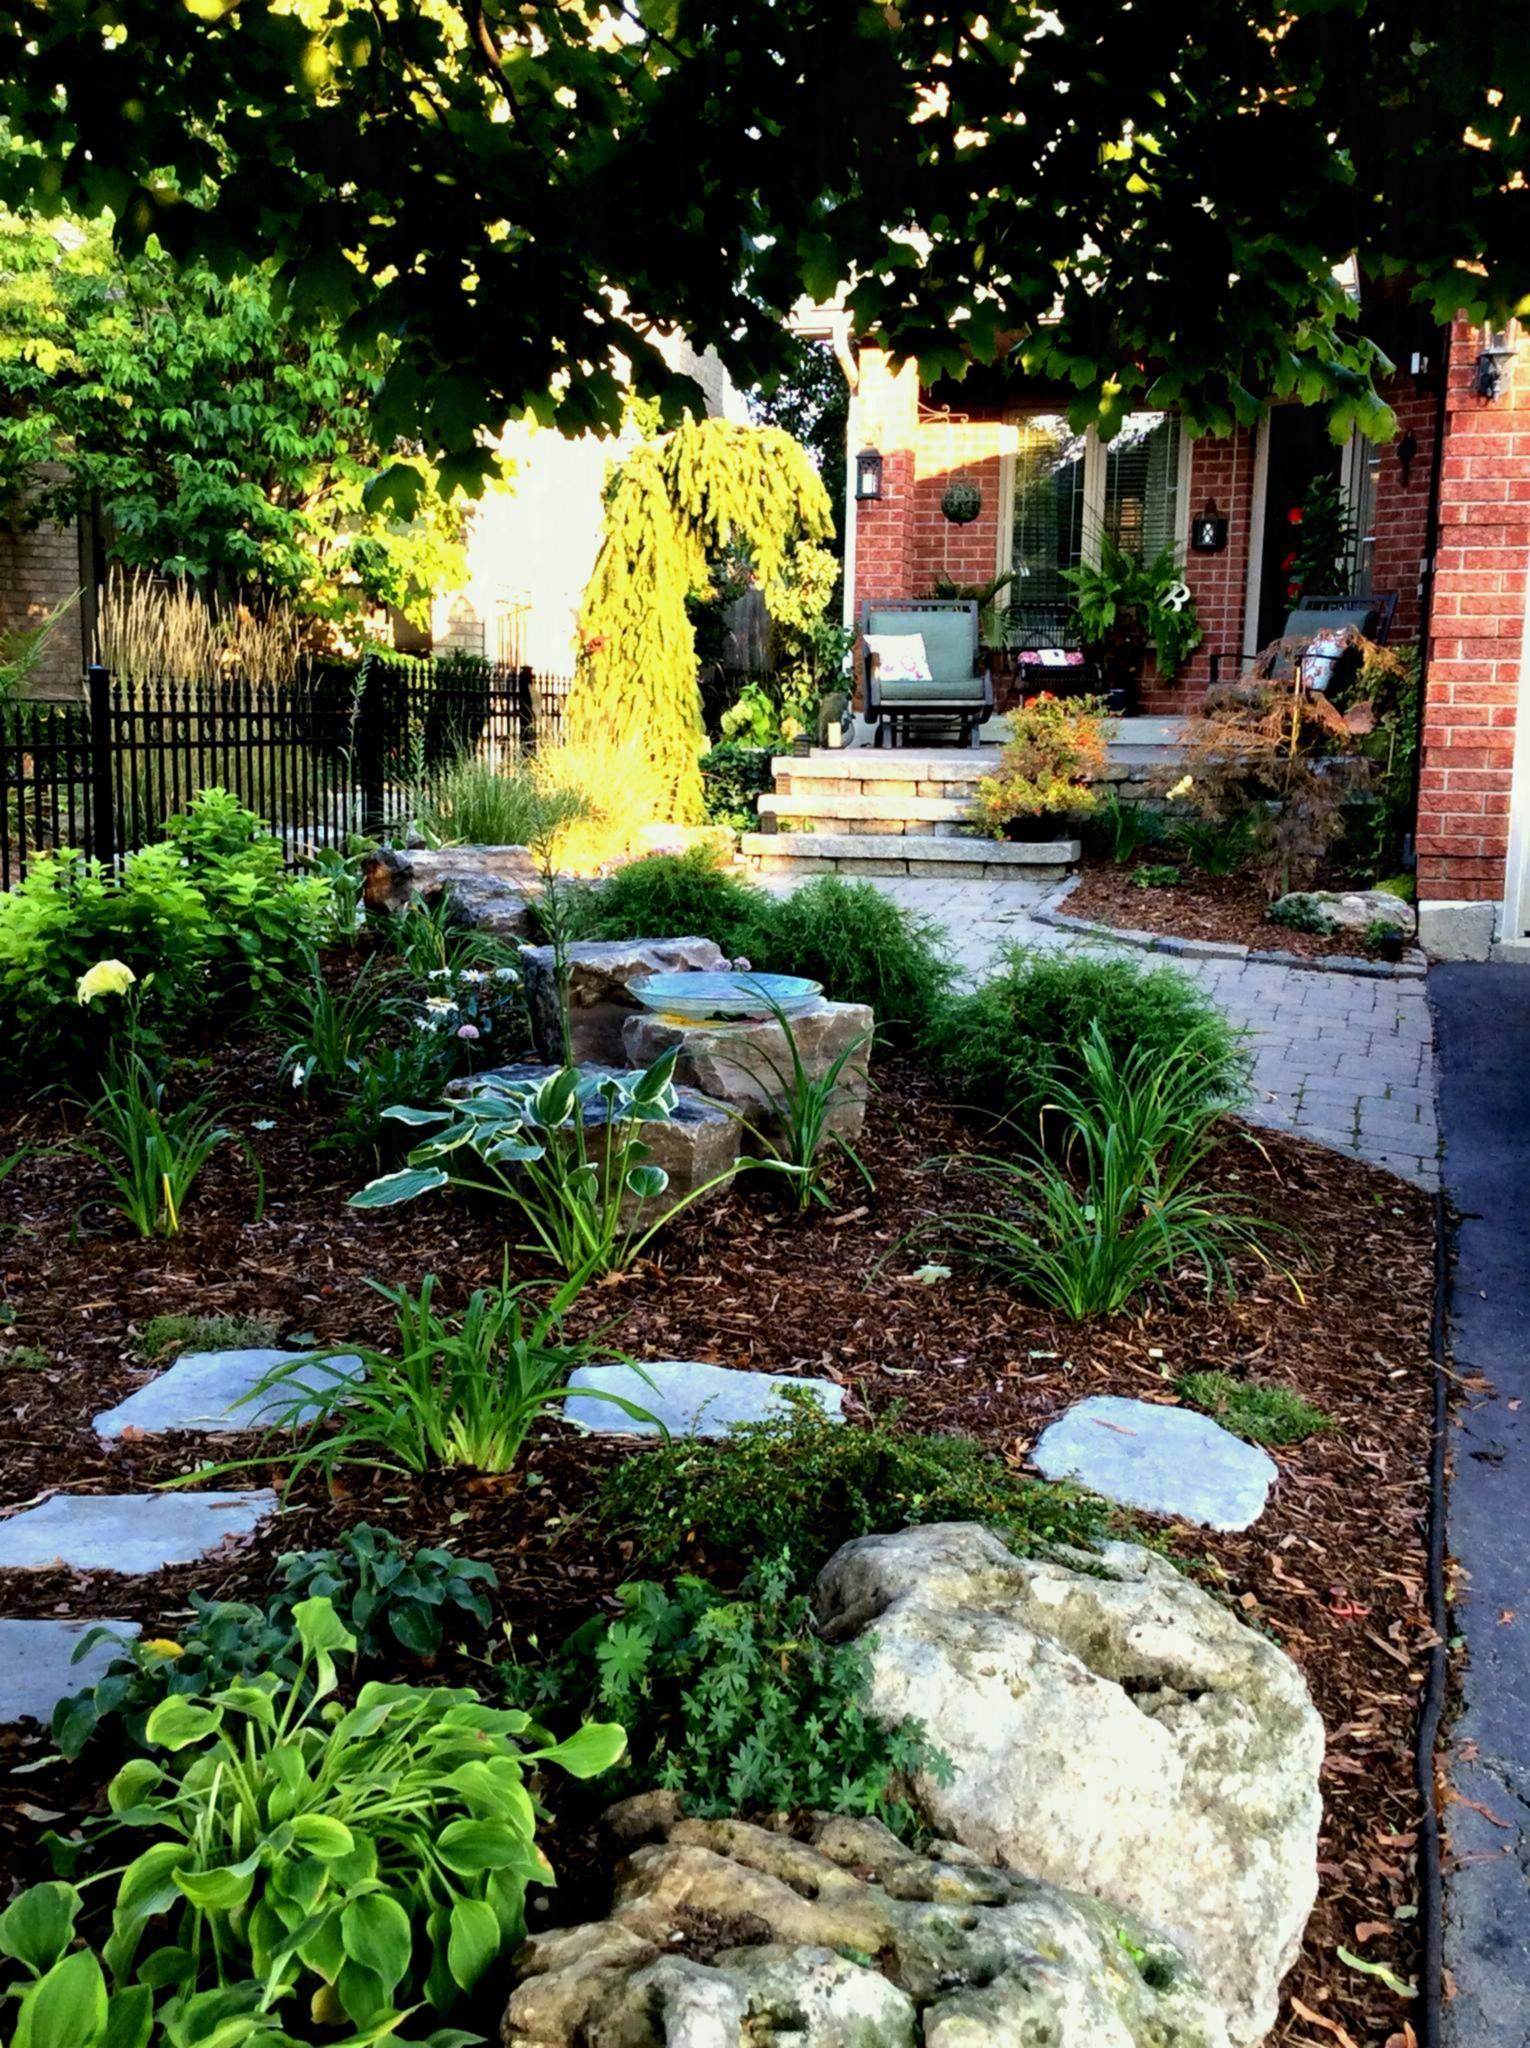 Full Size Of Backyard Back Porch Ideas On A Budget Diy ... on Cheap No Grass Backyard Ideas  id=22371